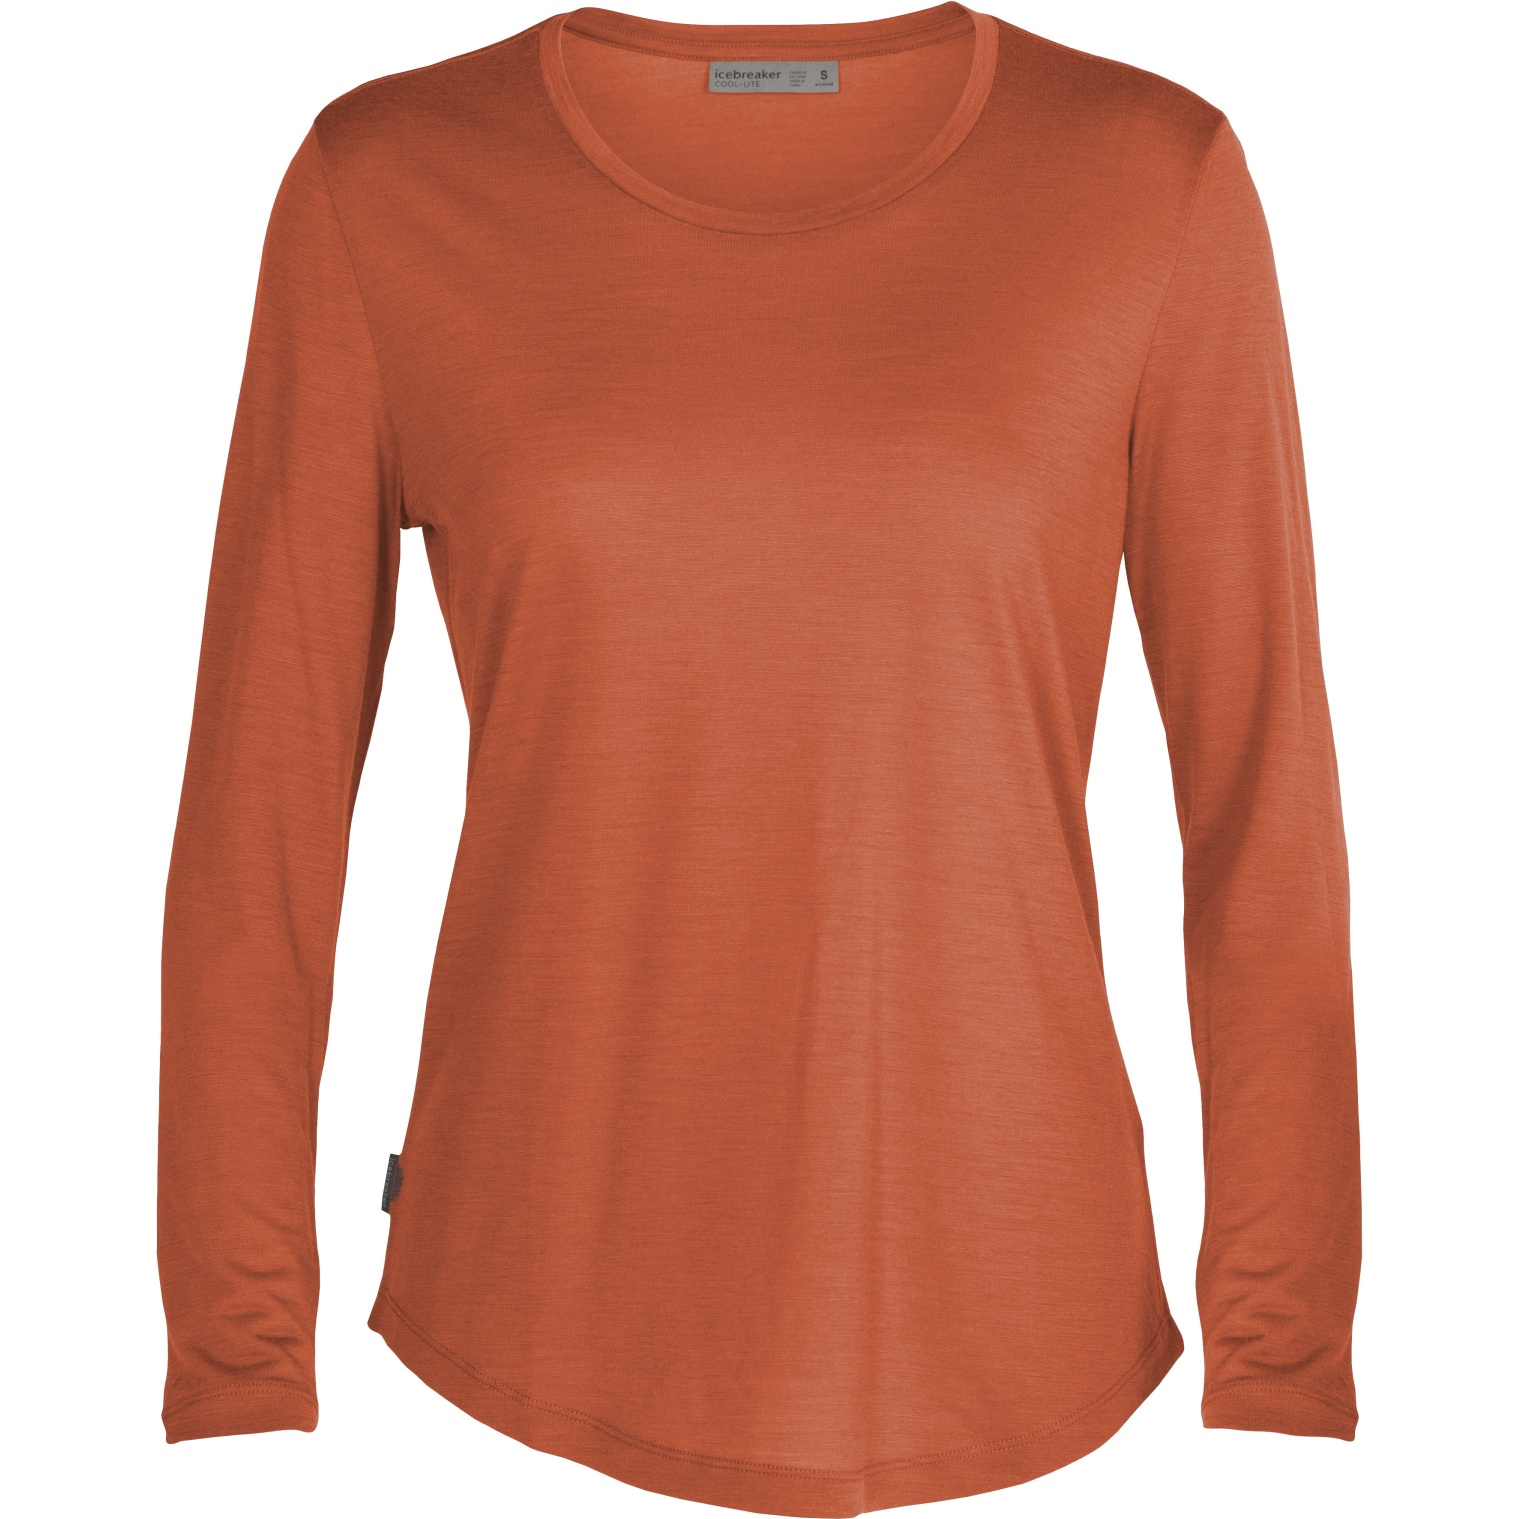 Produktbild von Icebreaker Sphere Low Crewe Damen Langarmshirt - Clay